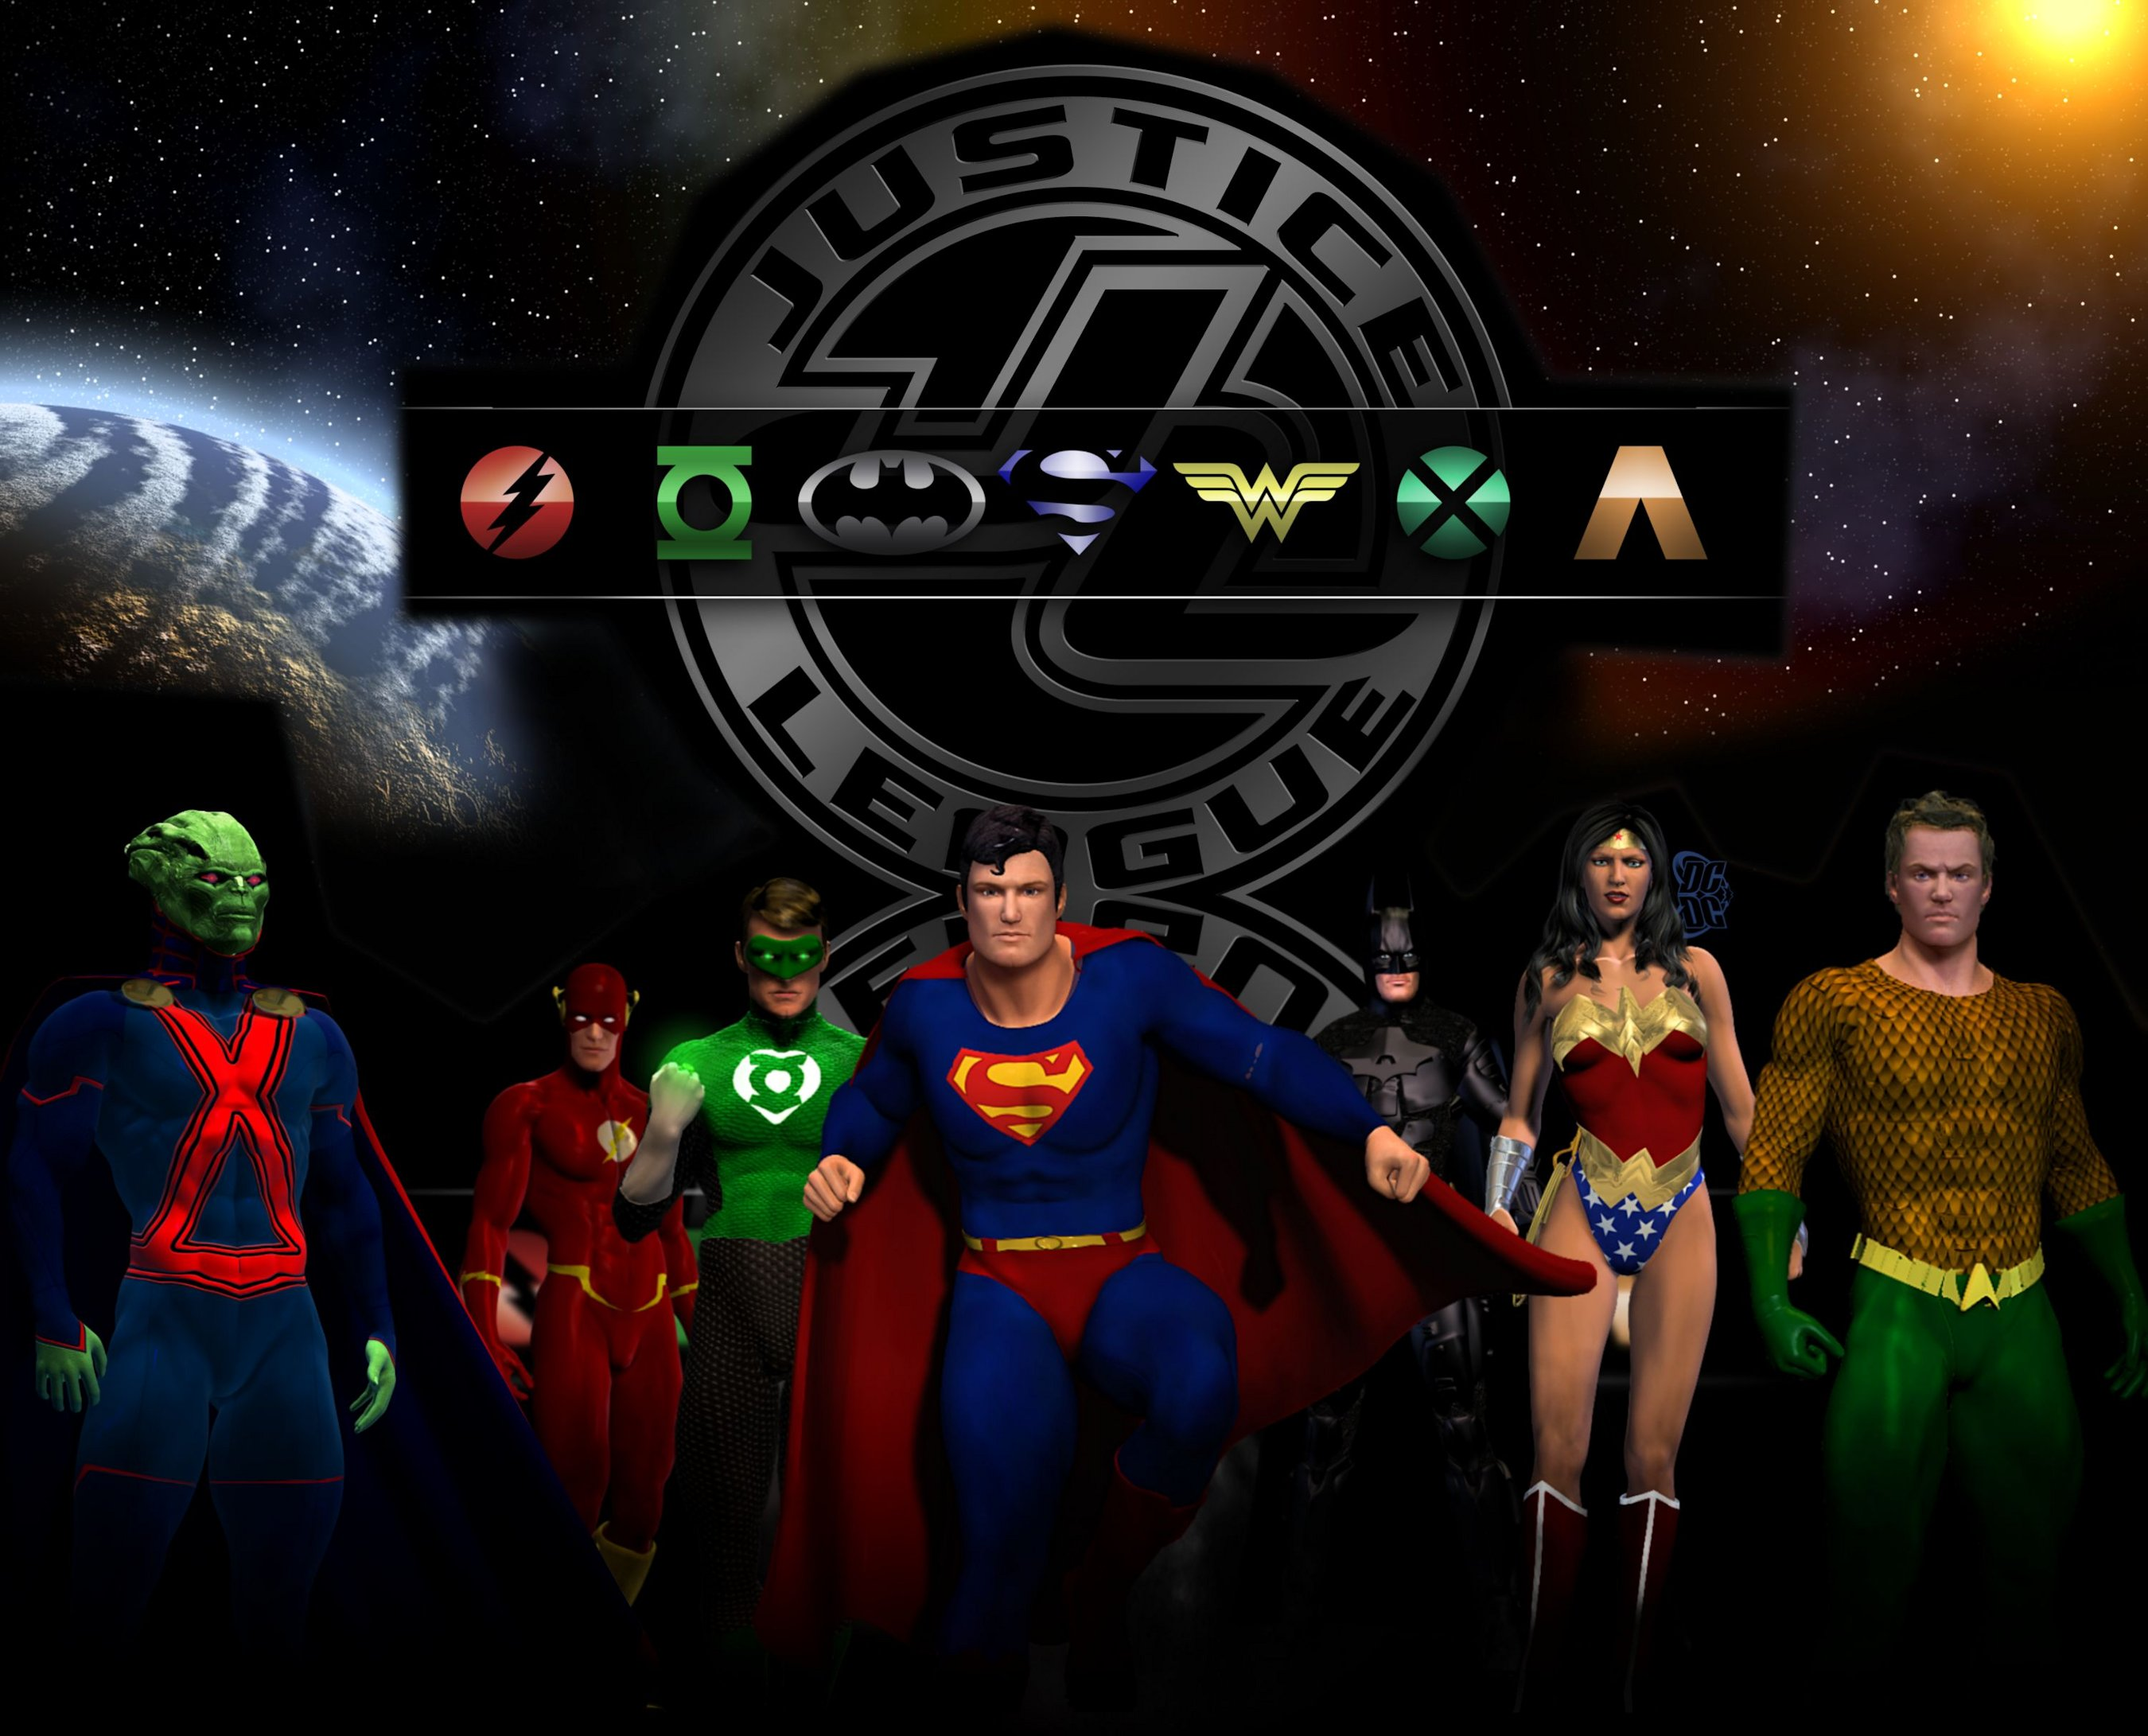 The Justice League Full HD Fondo De Pantalla And Fondo De